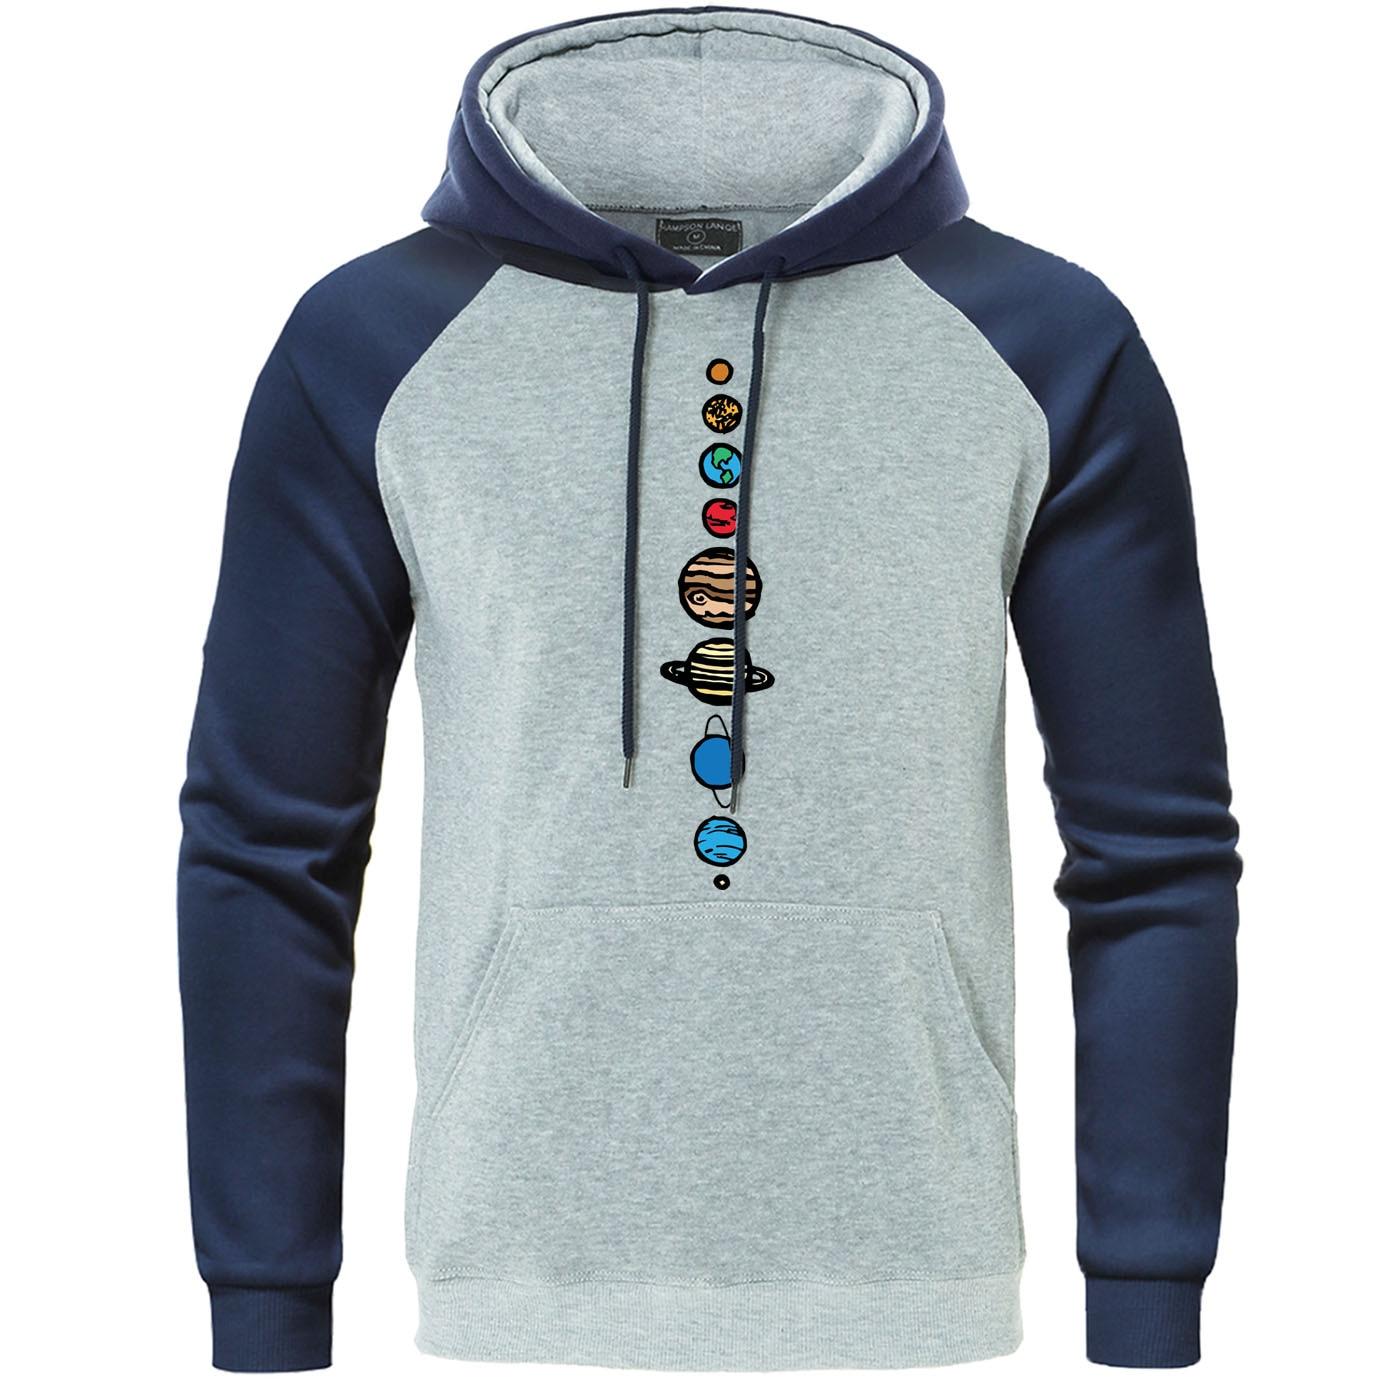 Universe Solar System Autumn Hoodies Raglan Sweatshirt Men Planets Colour Vintage Harajuku Streetwear Nine Planets Mens Pullover